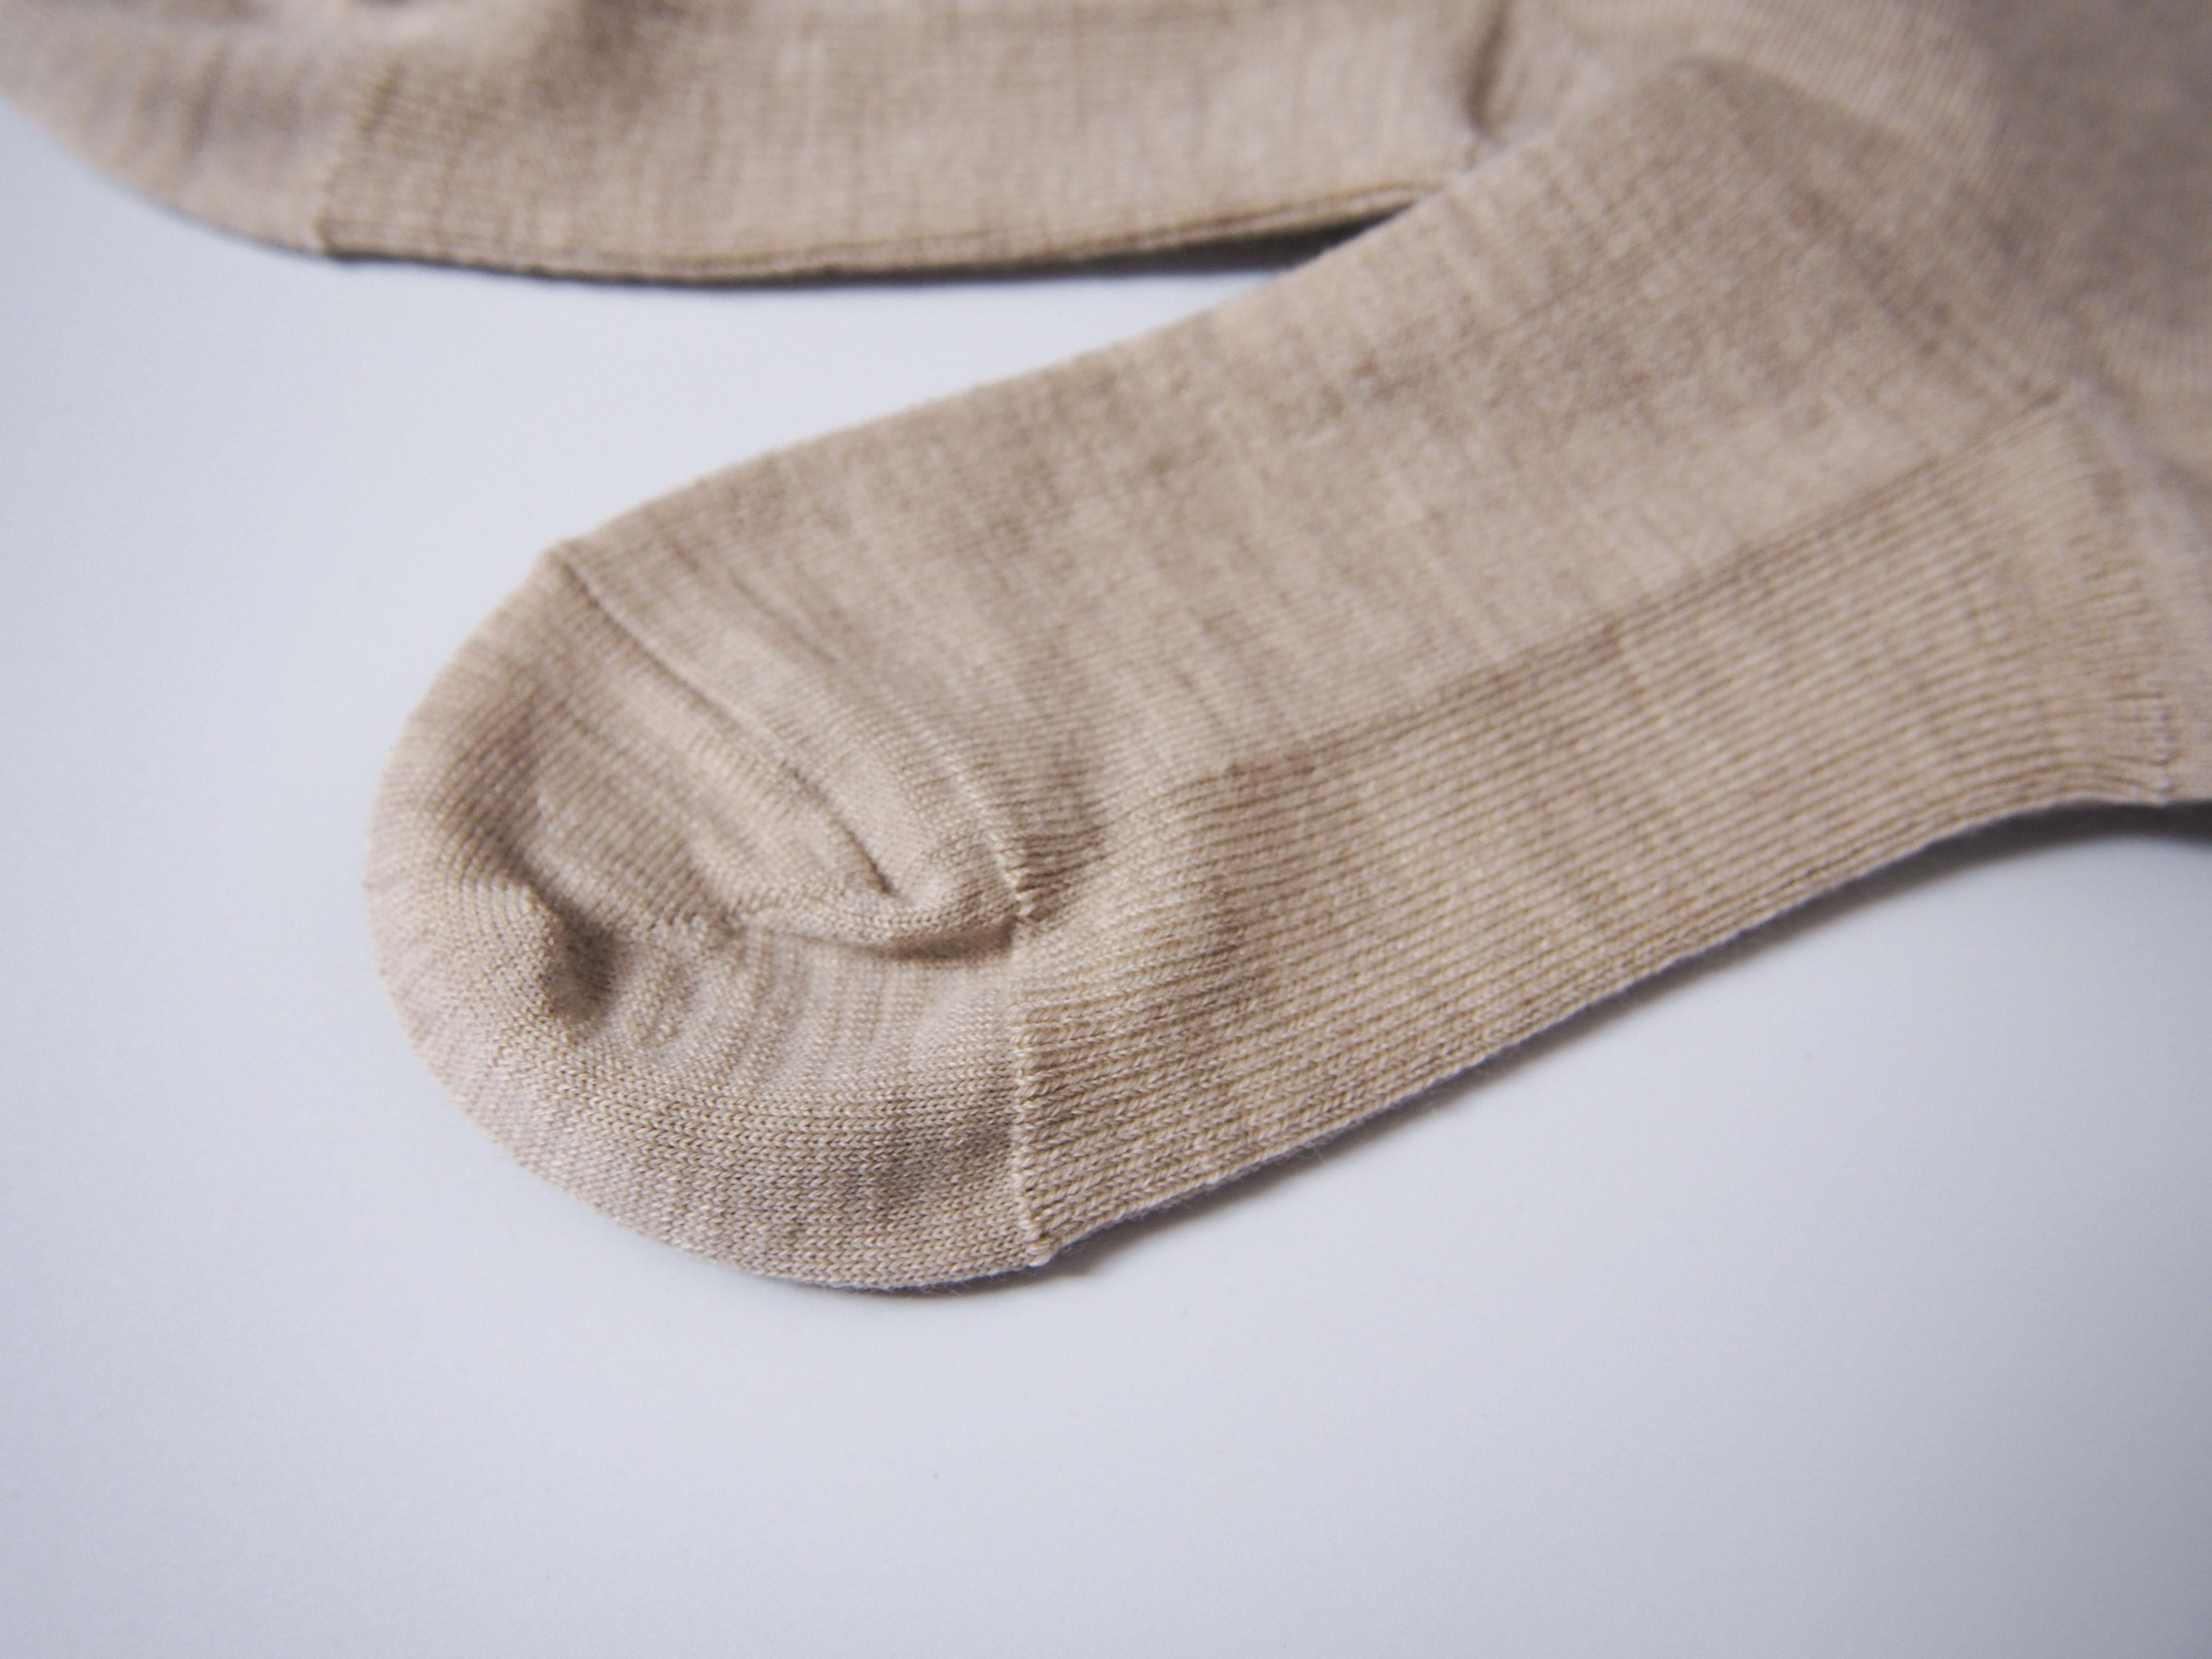 evam eva preshrunk wool socks